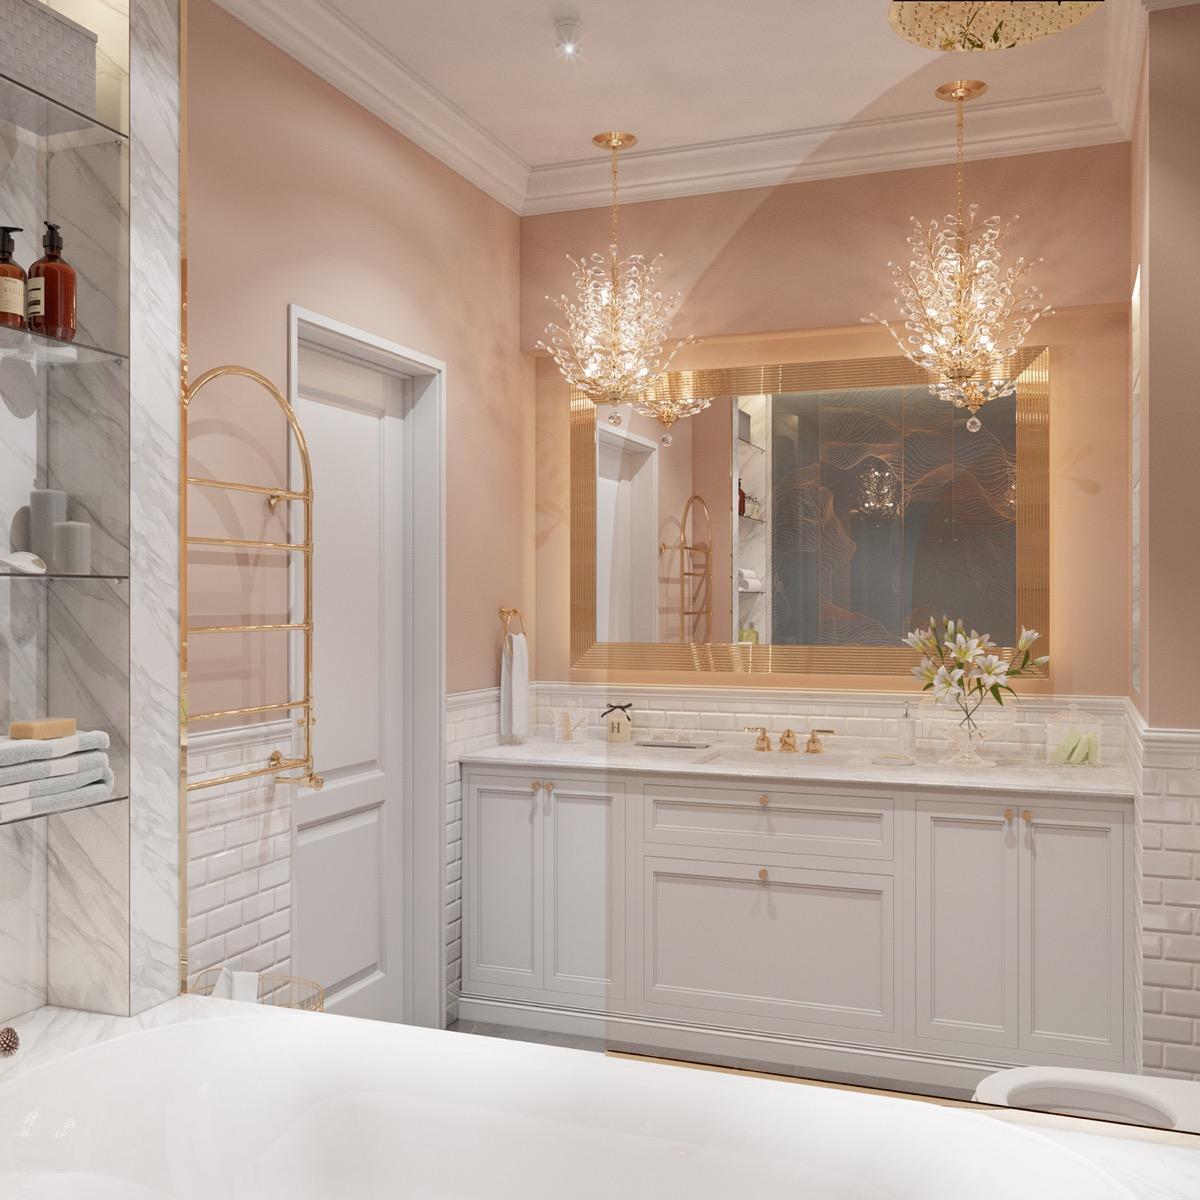 Crystal Bathroom Vanity Lights, Crystal Vanity Lights Bathroom